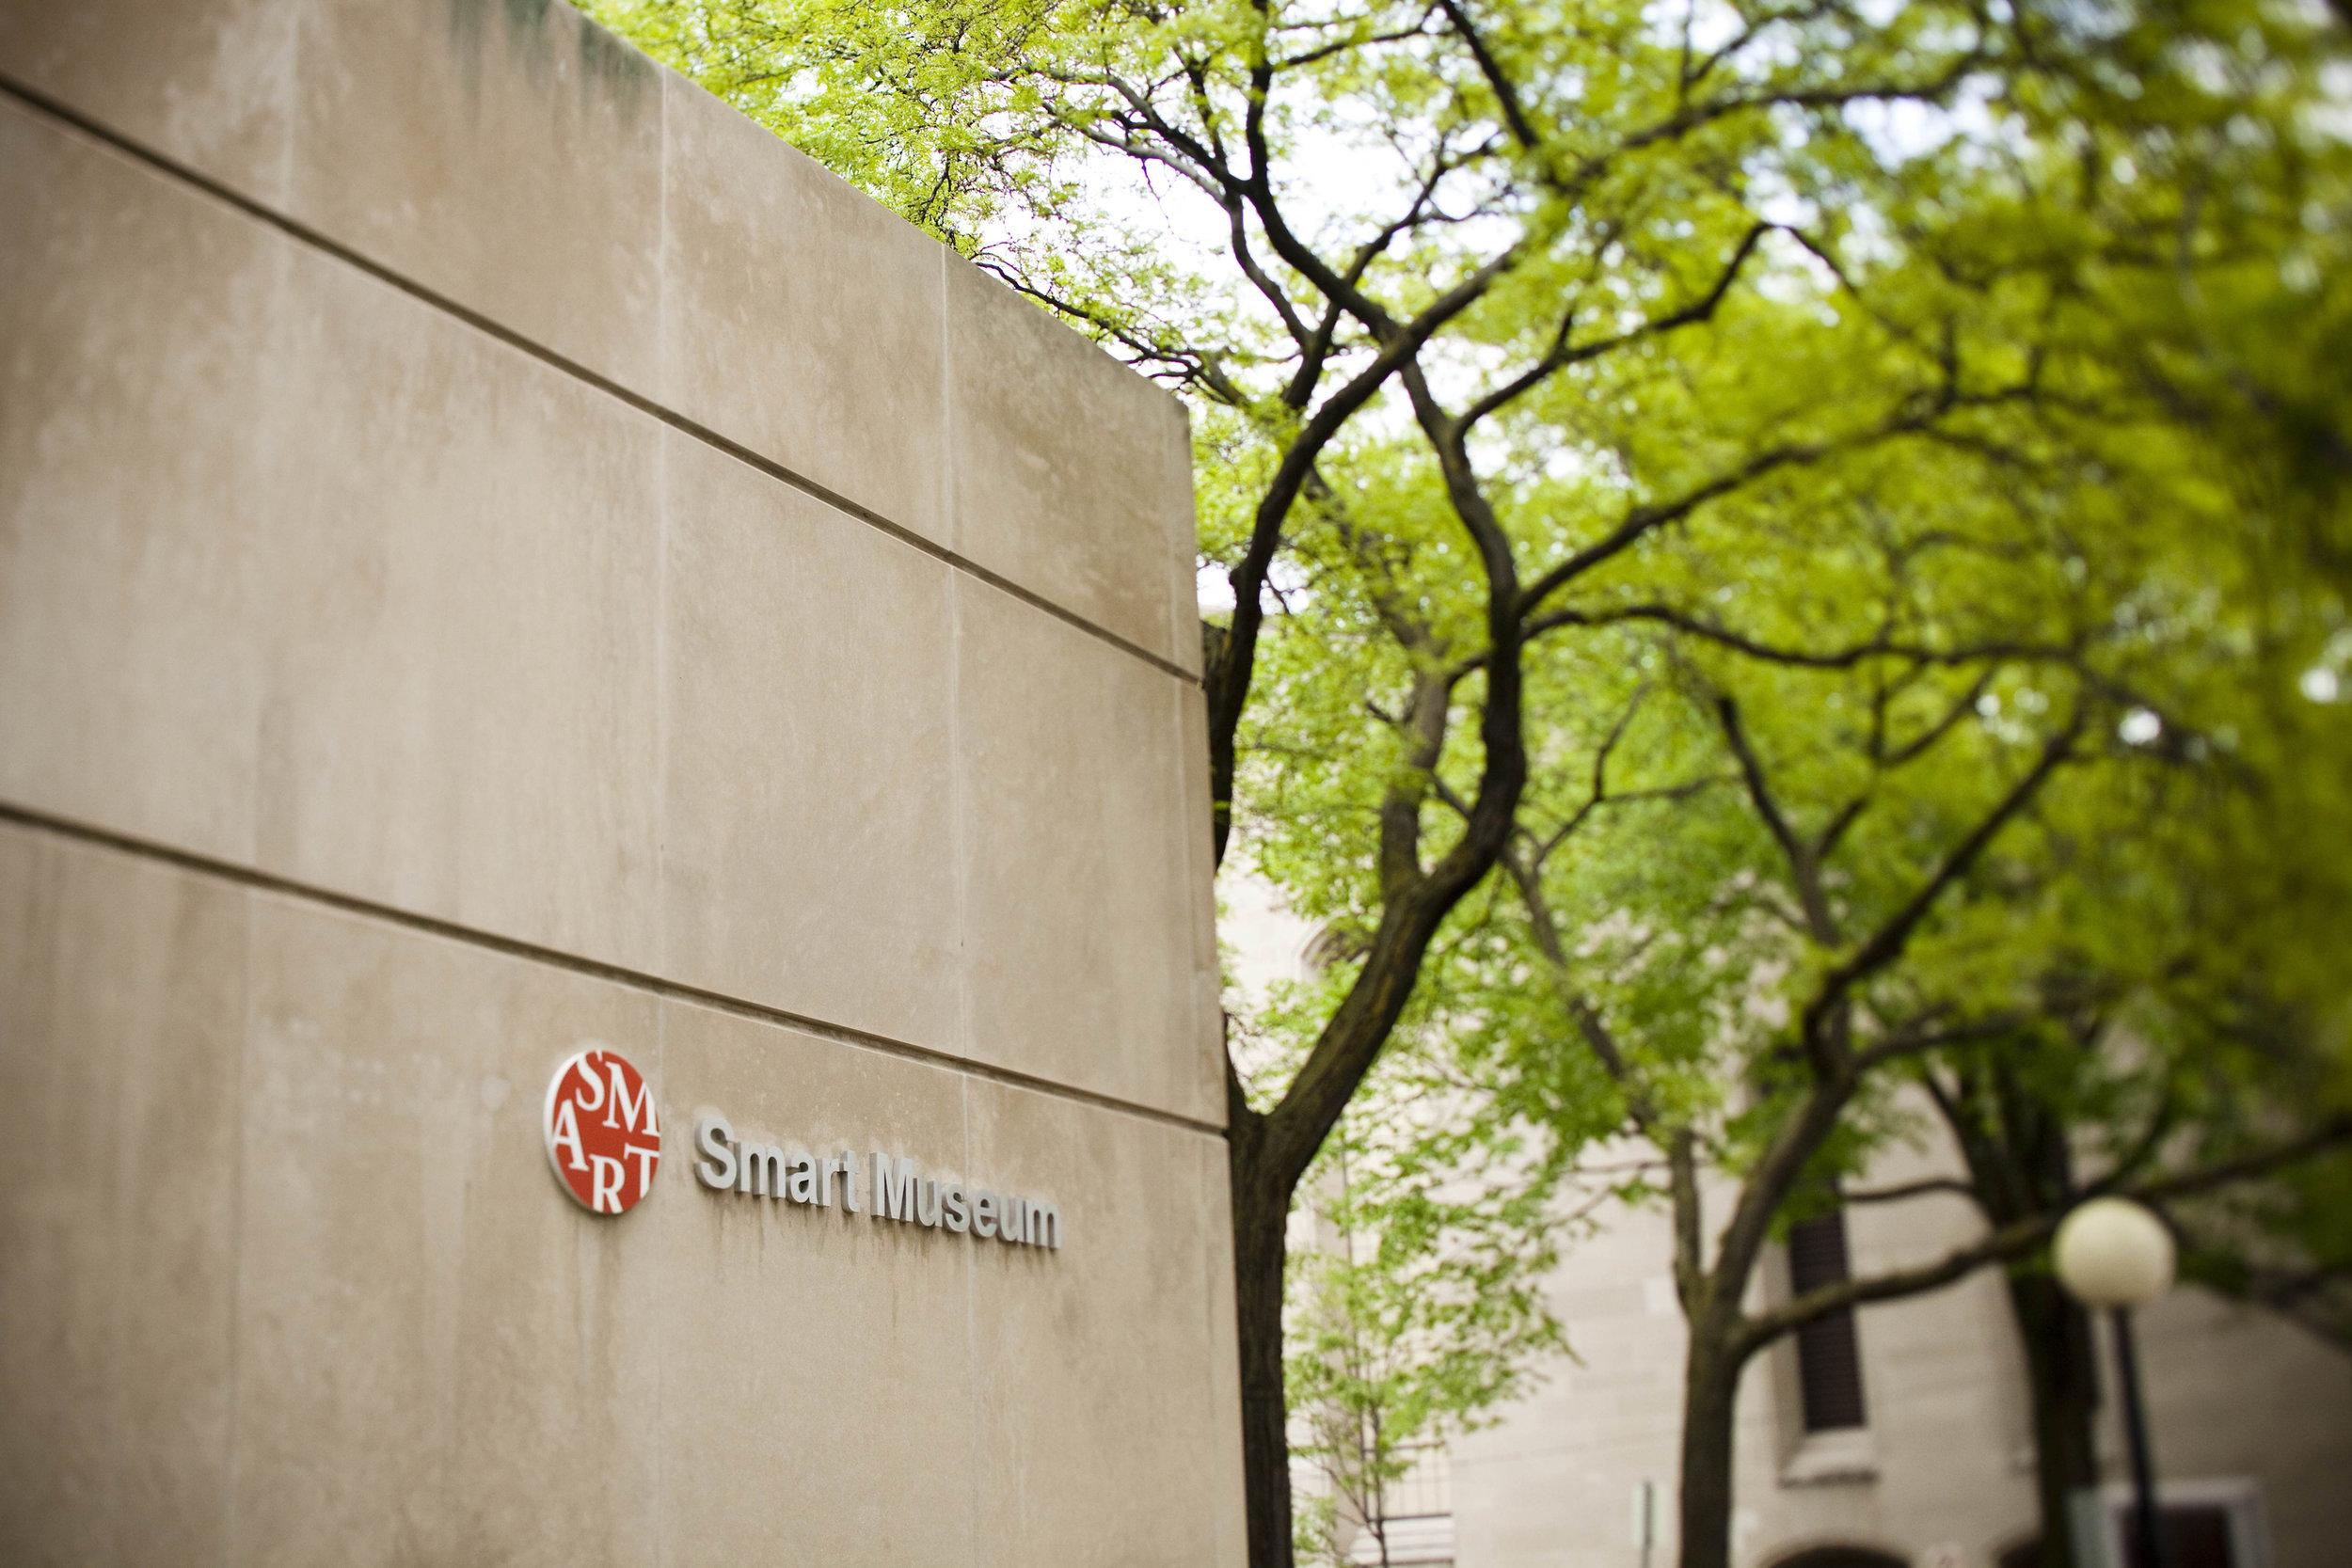 Smart_Museum-exterior.jpg